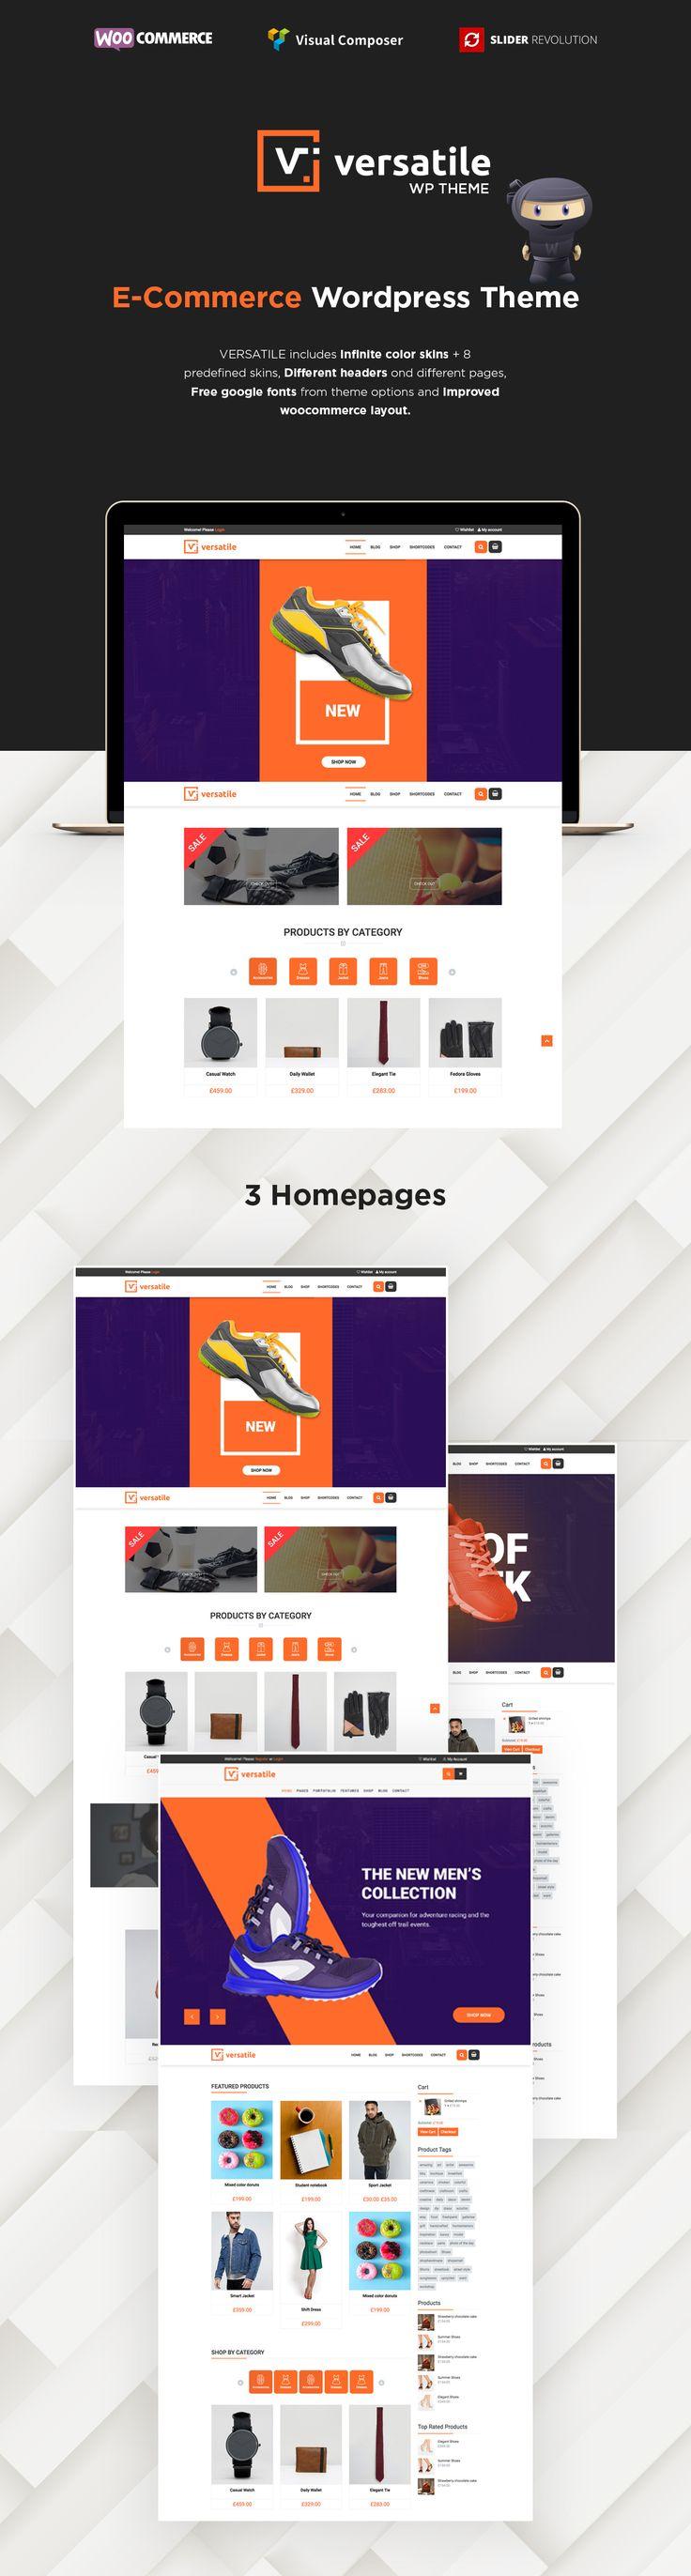 Versatile - Multipurpose WooCommerce WordPress Theme by modeltheme